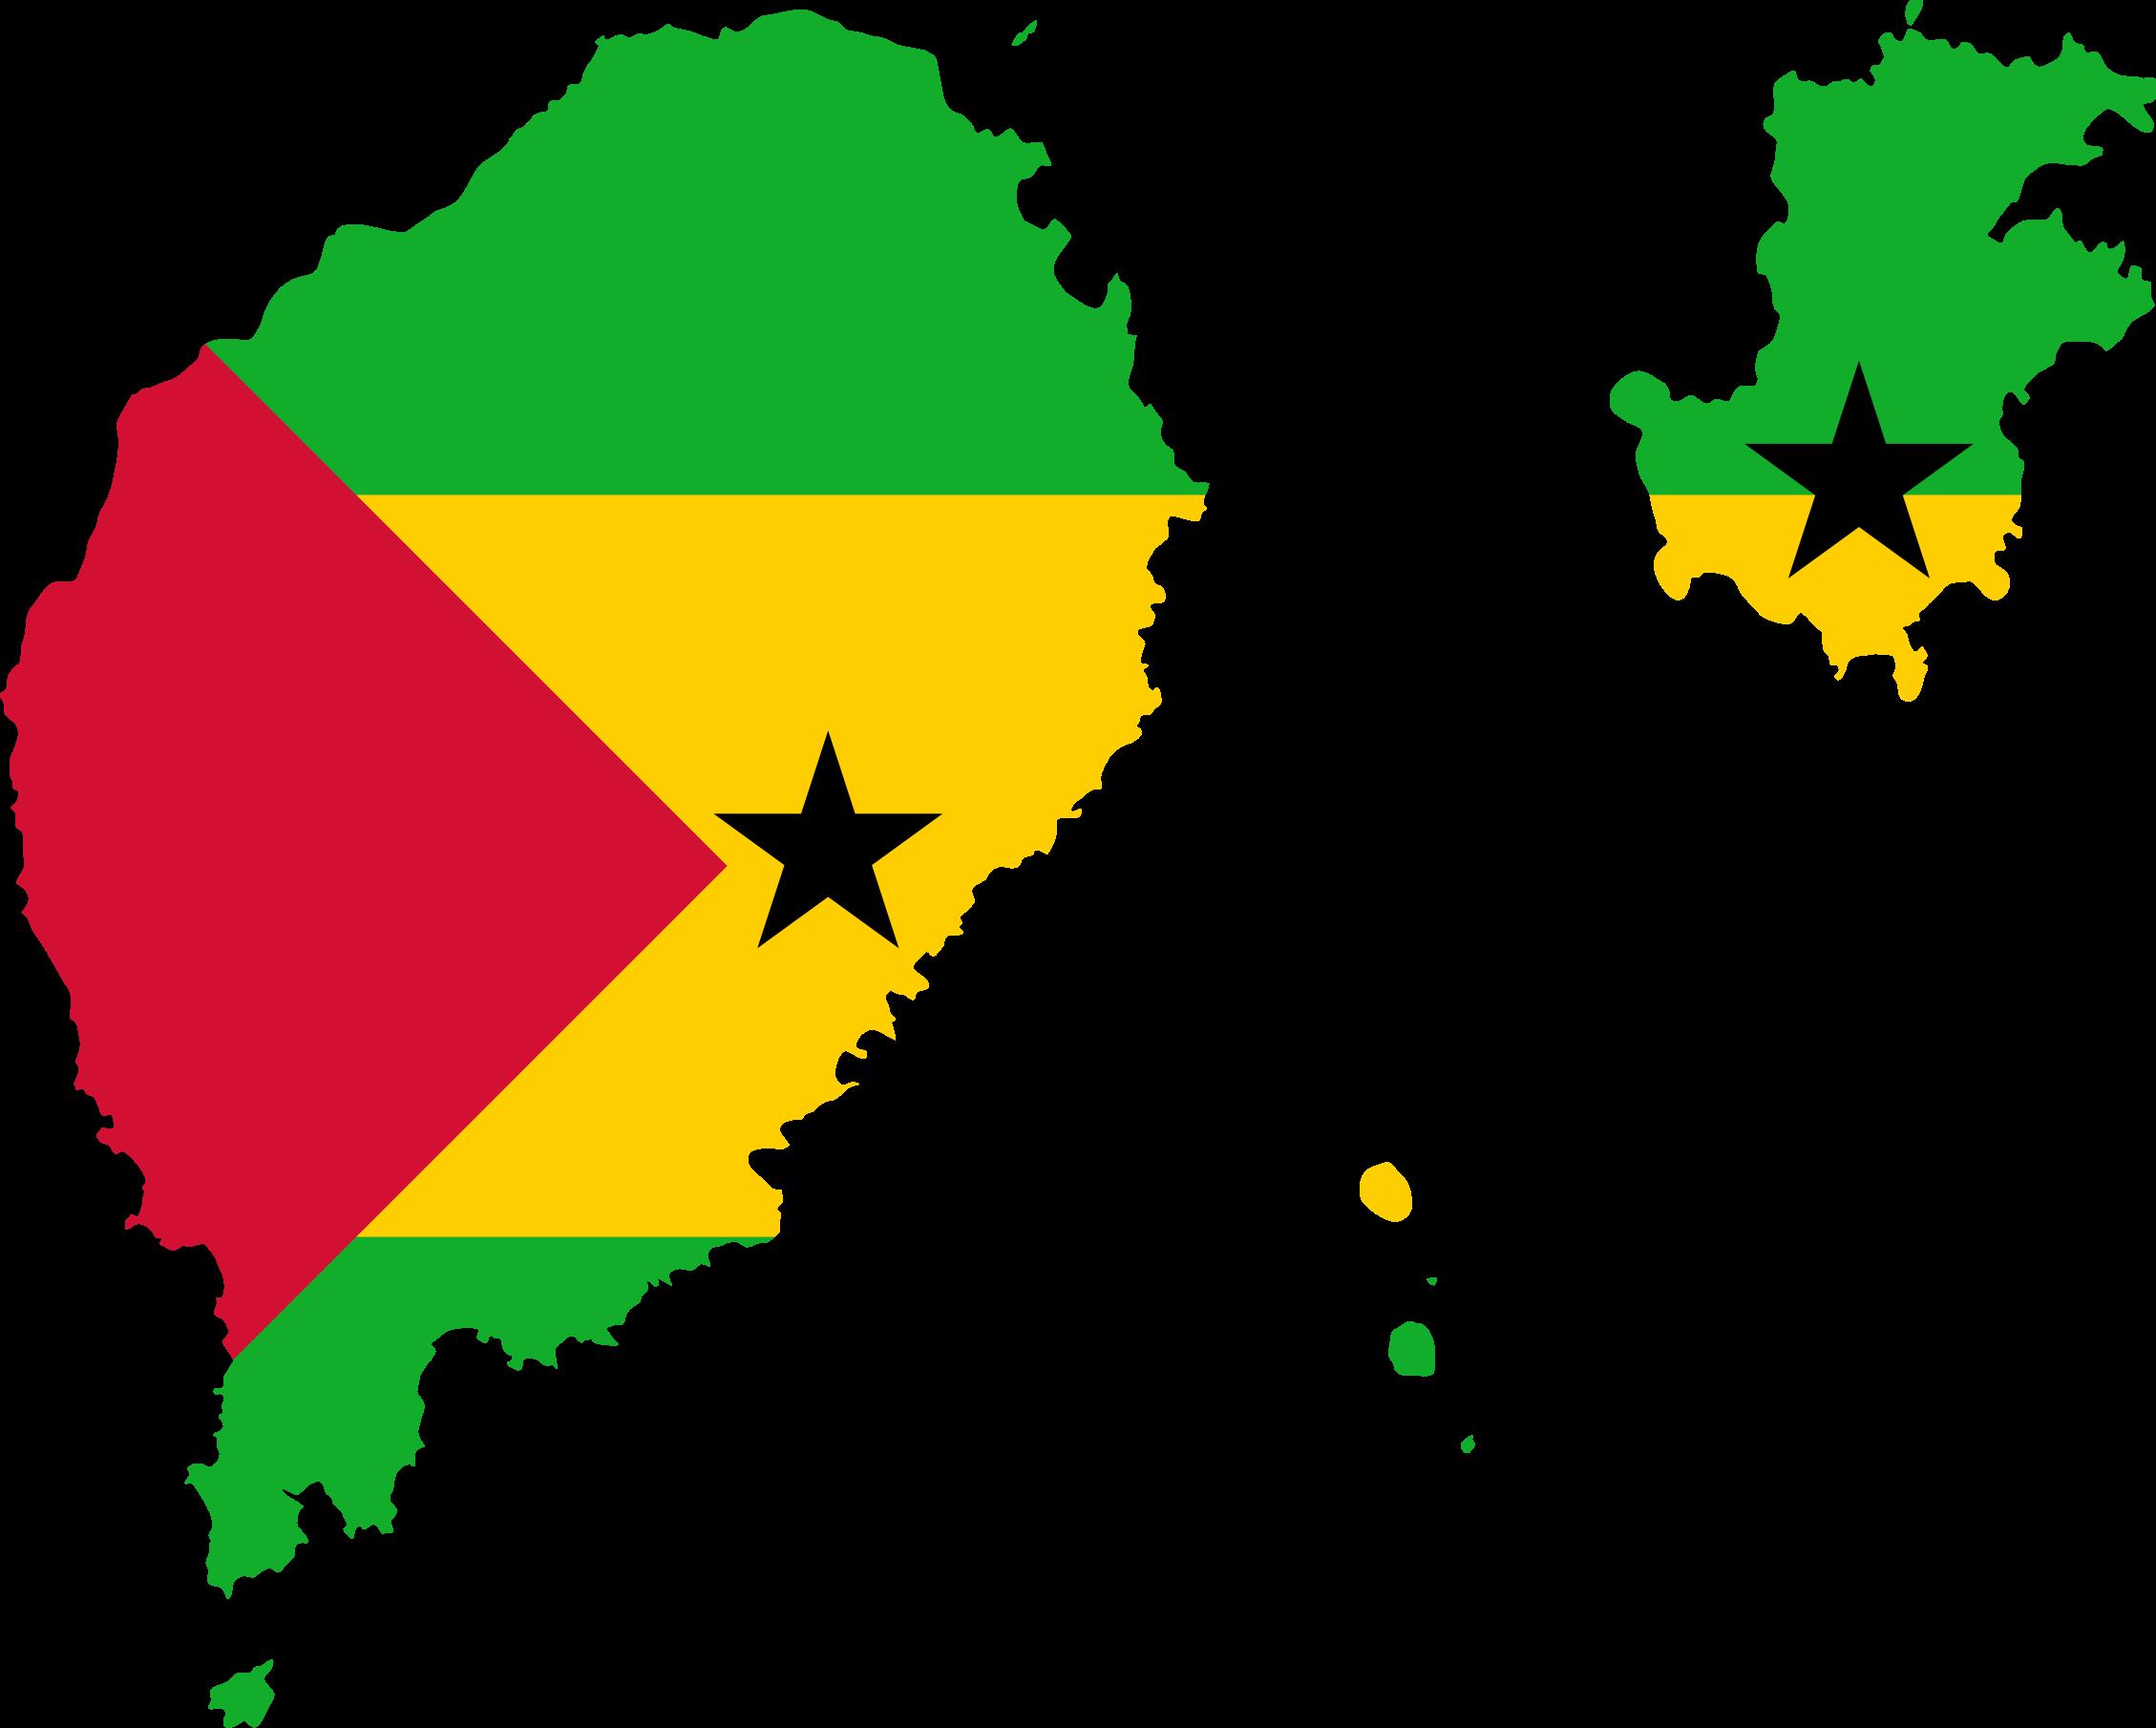 Clipart Sao Tome And Principe Flag Map - Sao tome and principe map